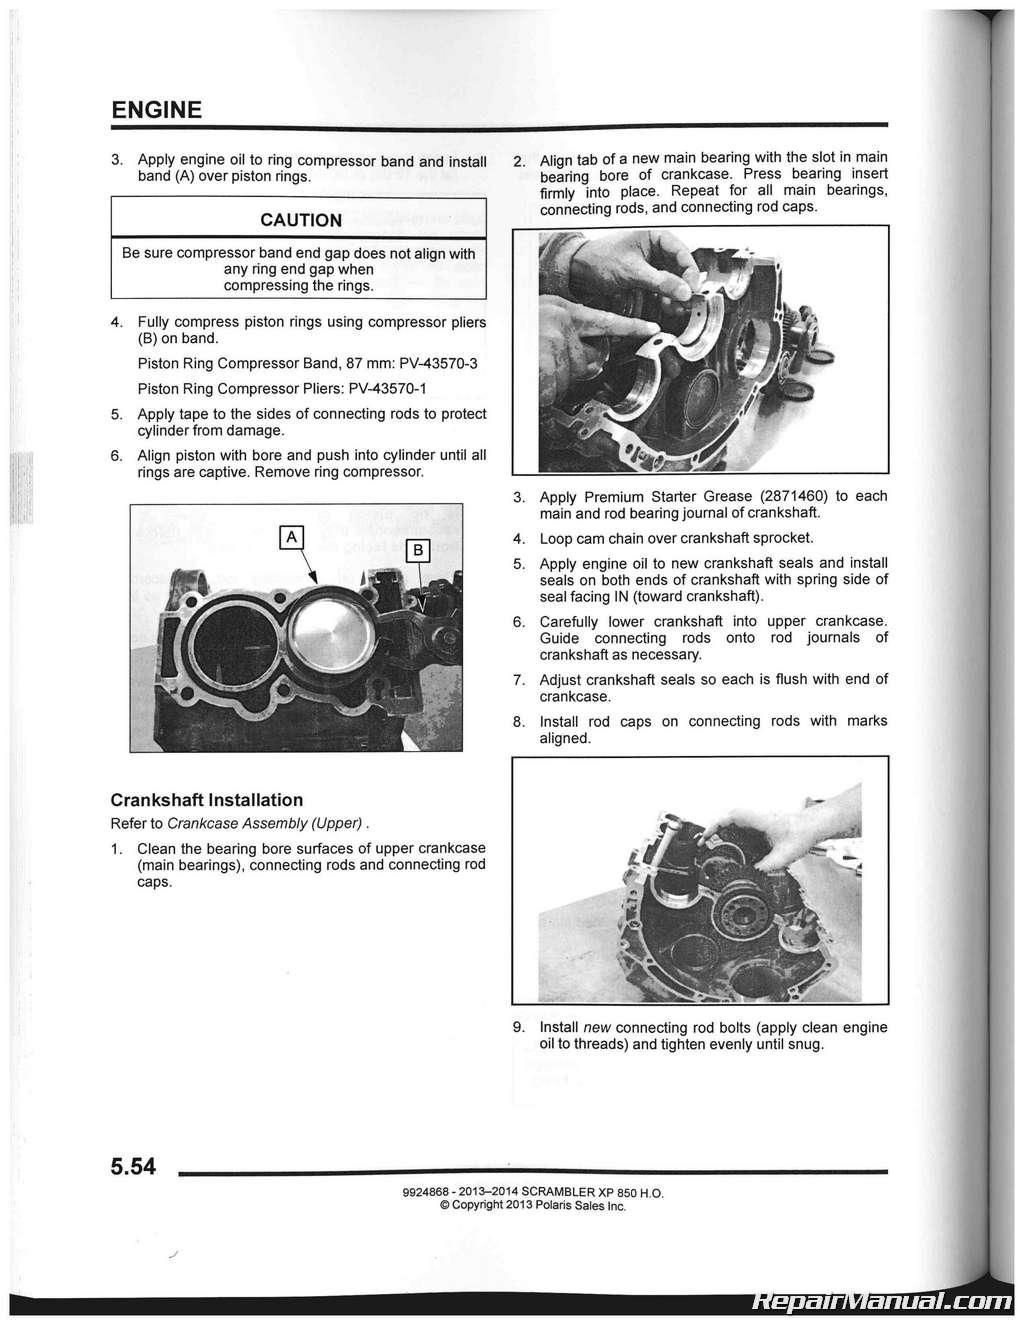 2013 polaris scrambler 850 service manual open source user manual u2022 rh dramatic varieties com 2013 polaris switchback assault service manual 2015 polaris service manual